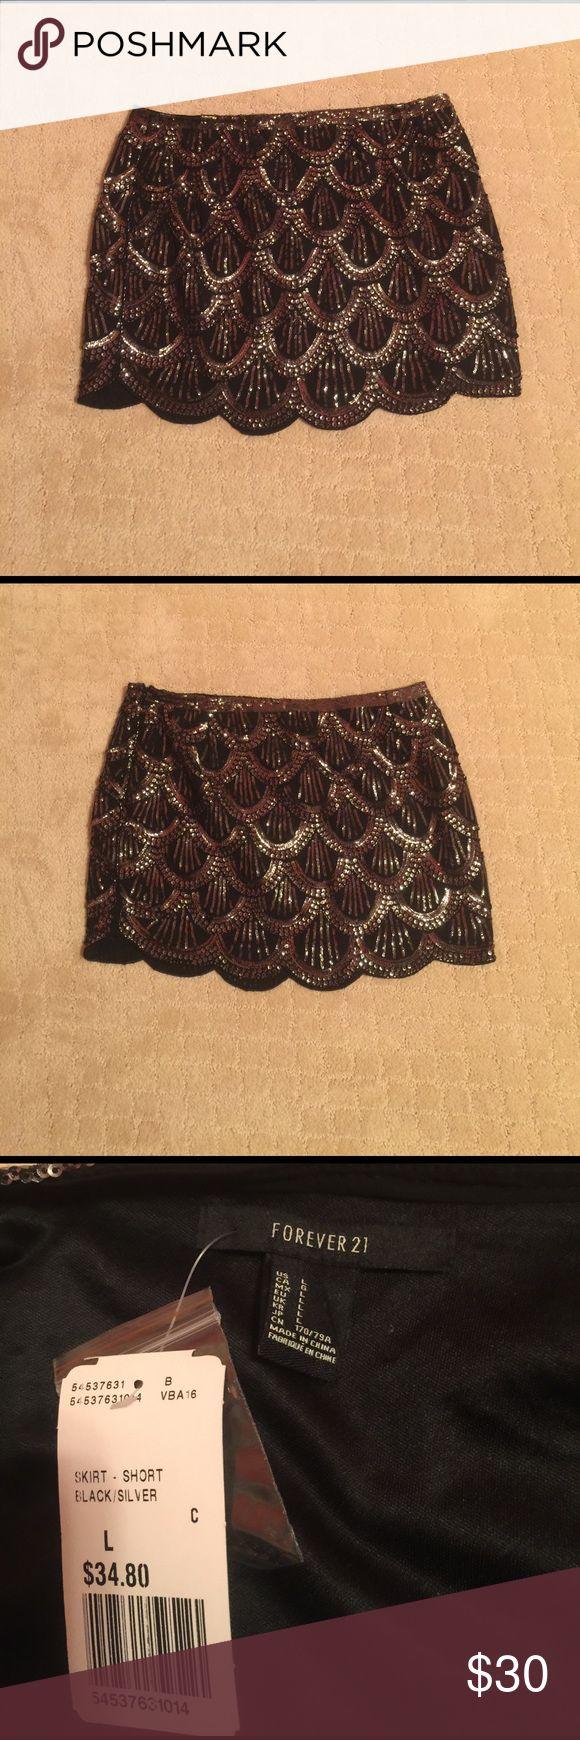 CLOSET CLOSING 3/31 - Forever 21 sparkle skirt CLOSET CLOSING 3/31 - Forever 21 sparkle skirt! Everything must go! Forever 21 Skirts Mini